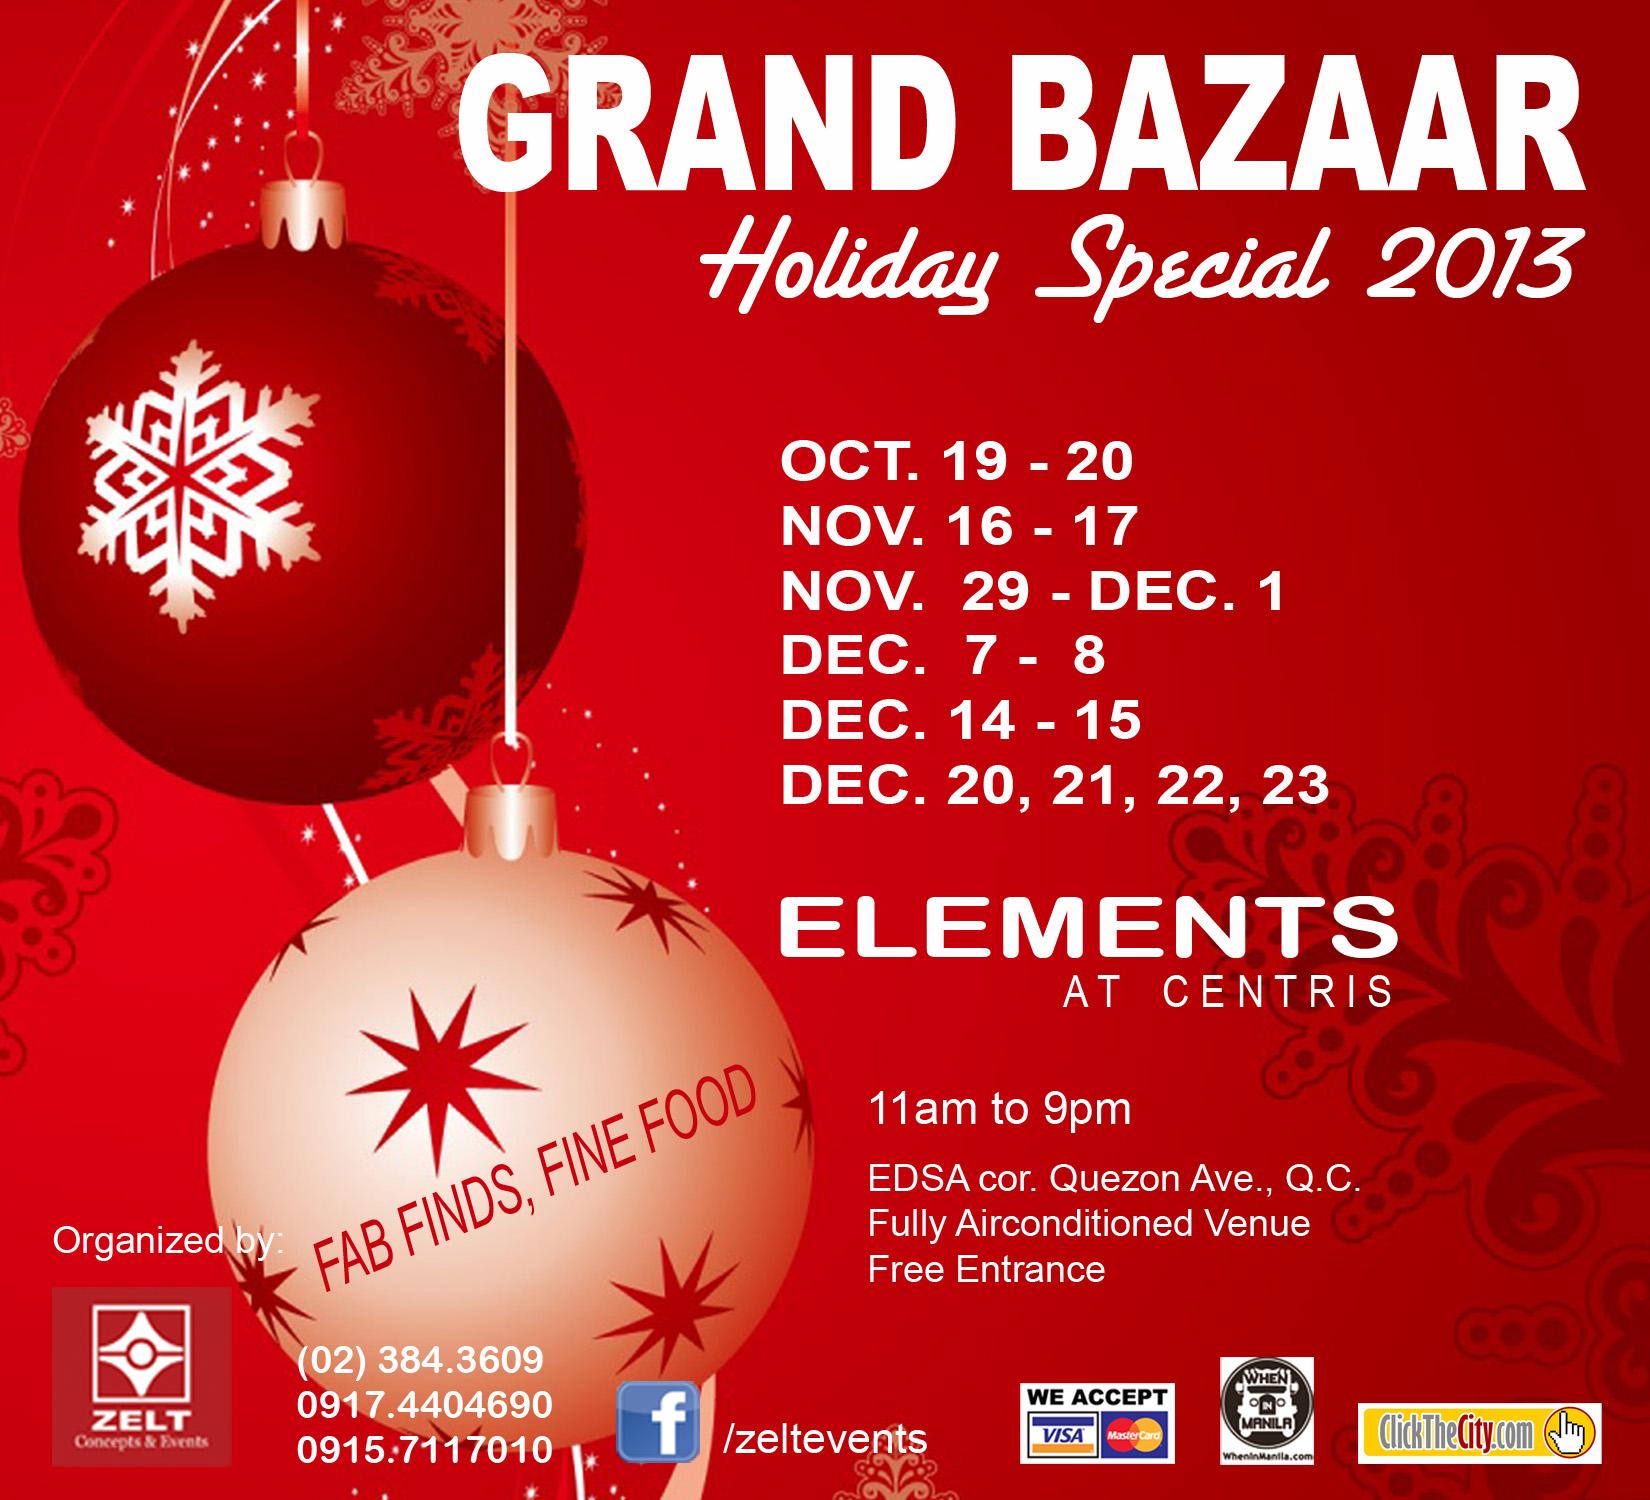 Grand Bazaar @ Elements, Eton Centris October - December 2013